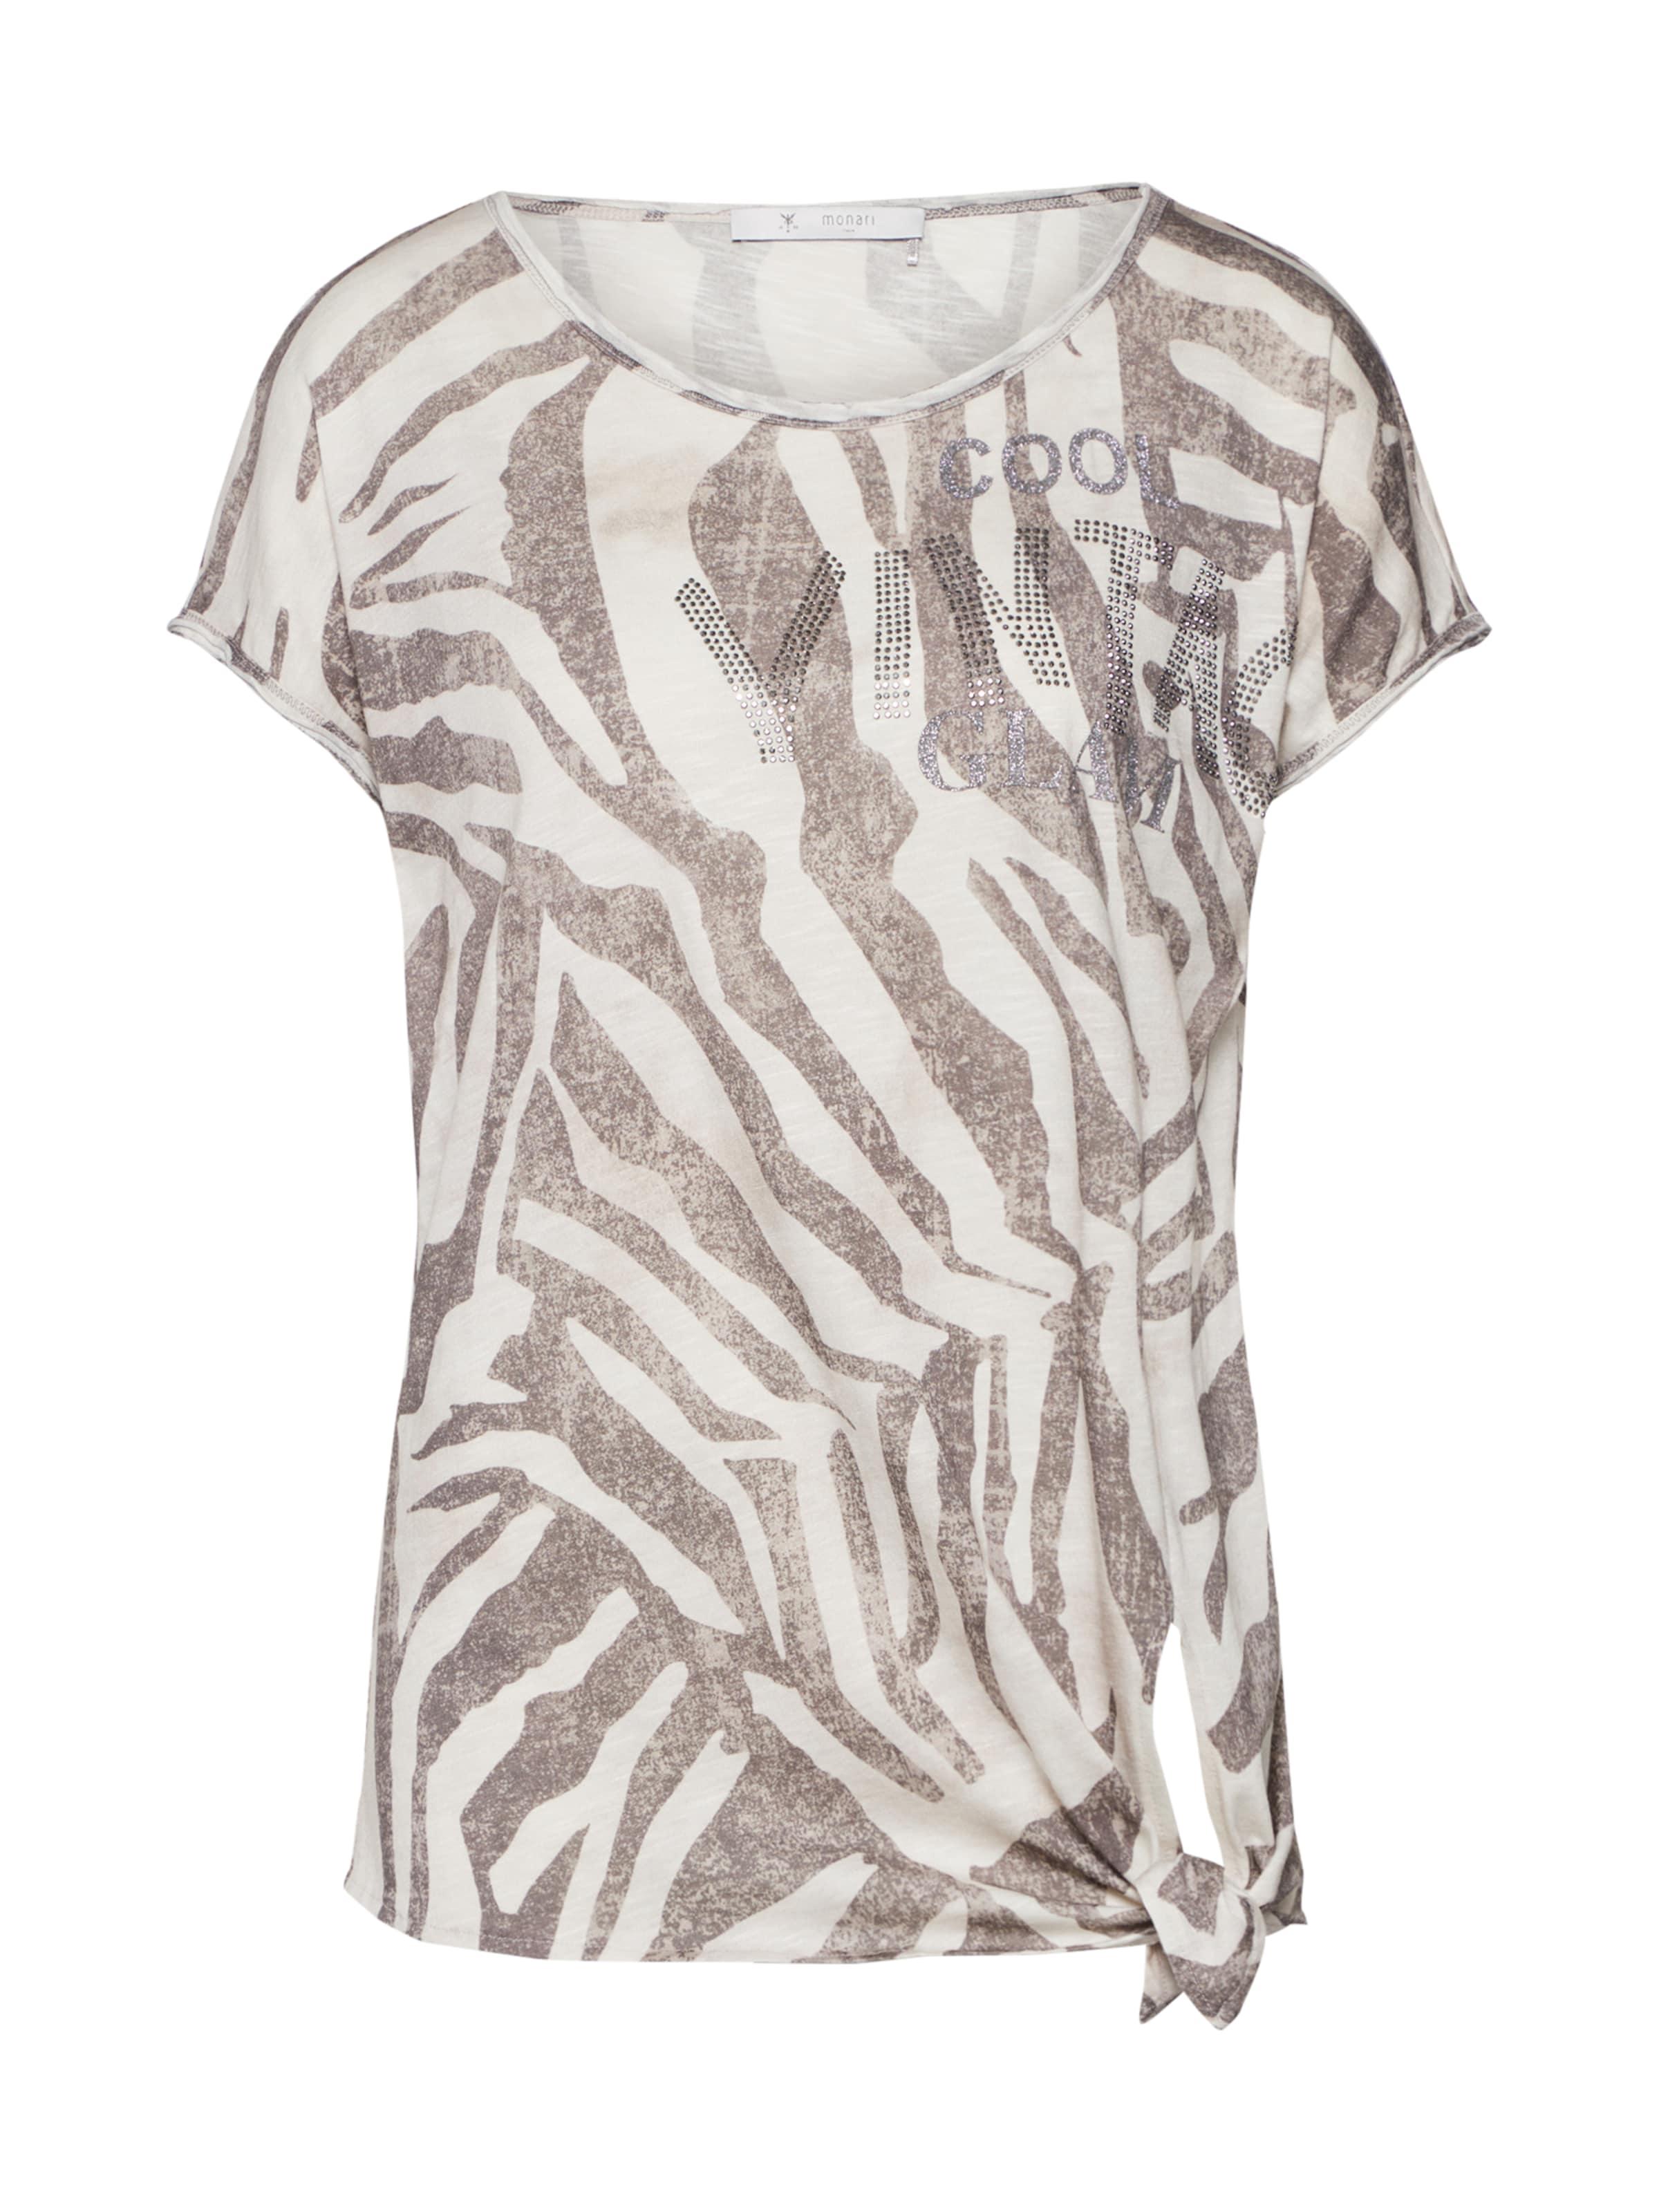 Monari shirt Beige En T Beige shirt Monari En shirt Monari En T T Ny8nwPmv0O